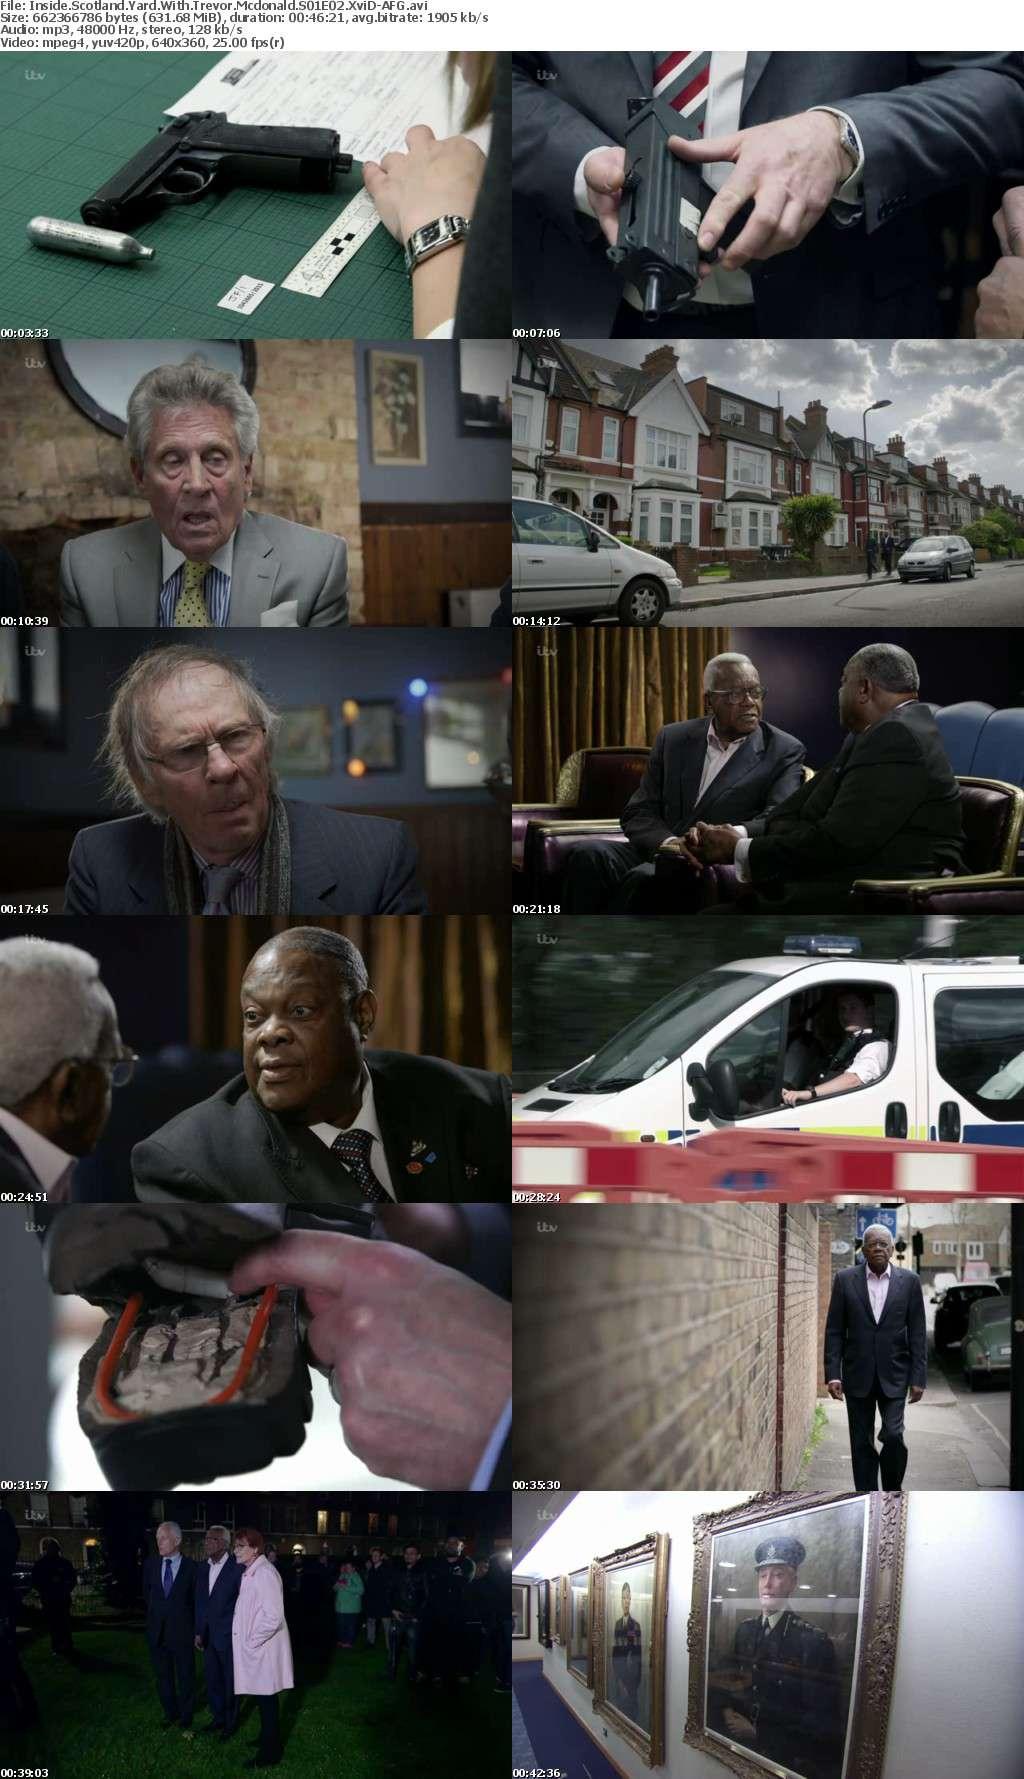 Inside Scotland Yard With Trevor Mcdonald S01E02 XviD-AFG